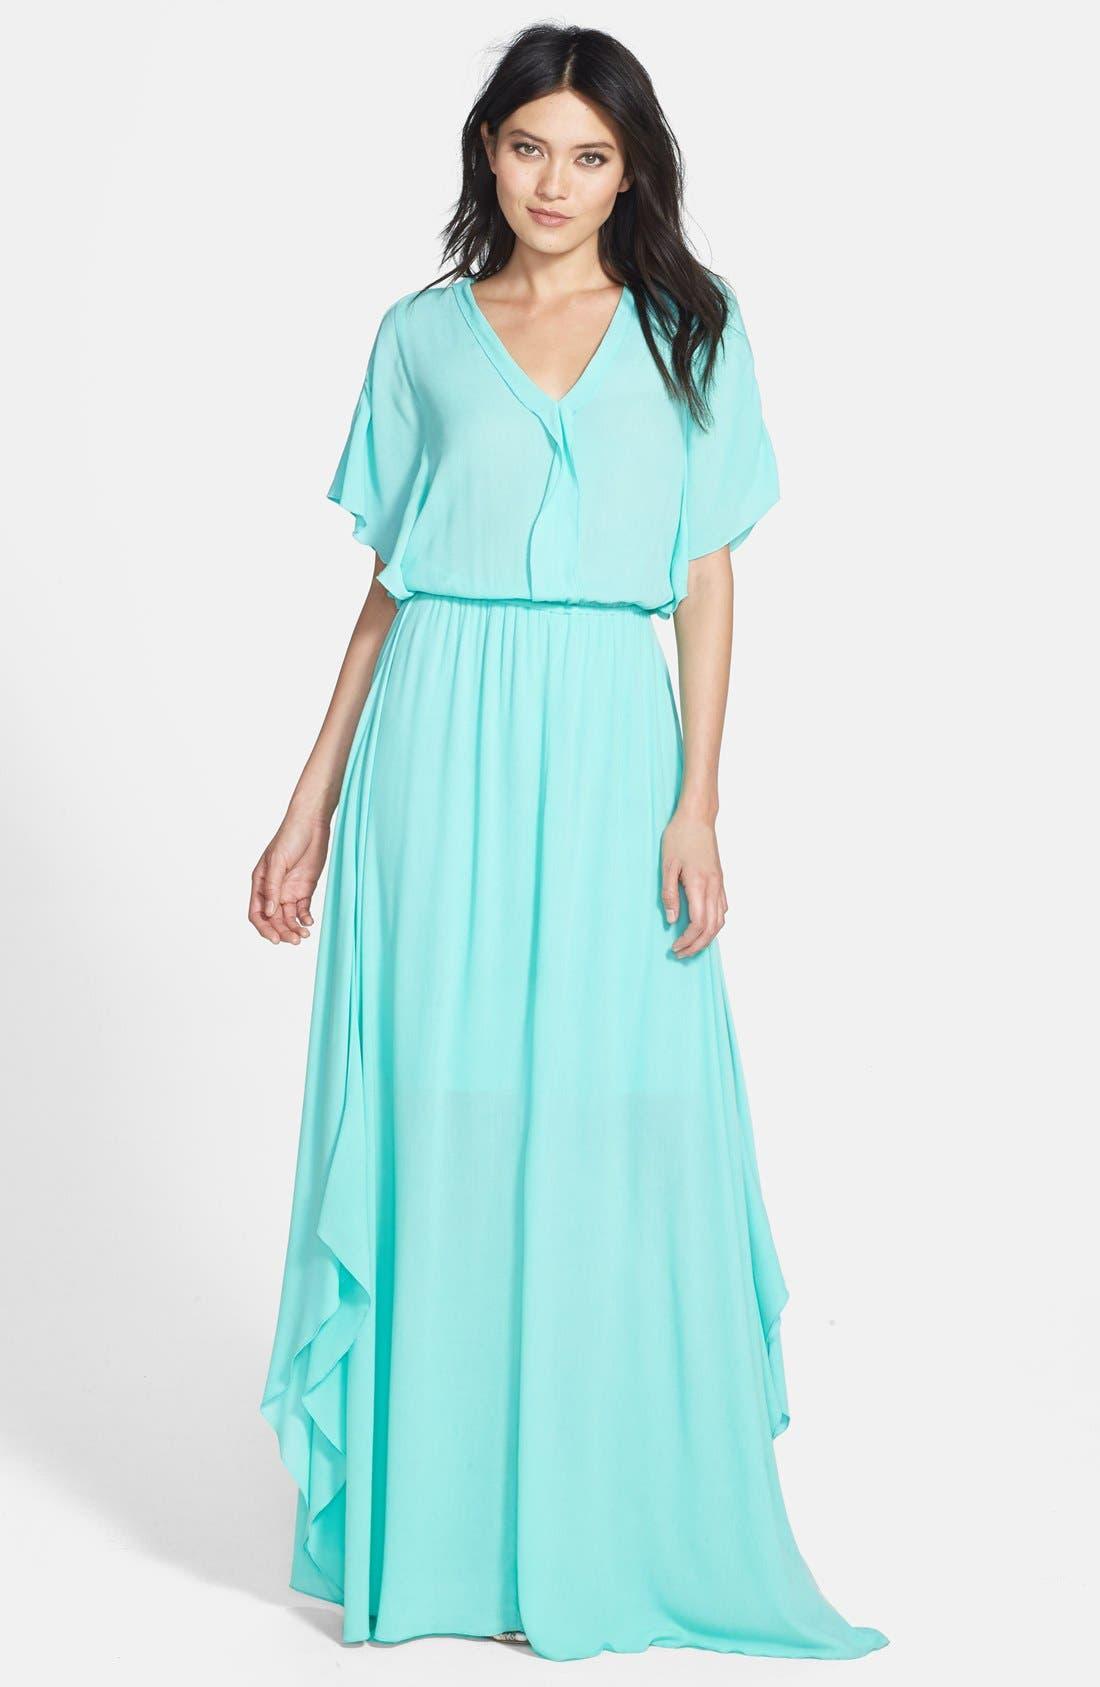 Alternate Image 1 Selected - Ella Moss 'Stella' Ruffle Blouson Maxi Dress